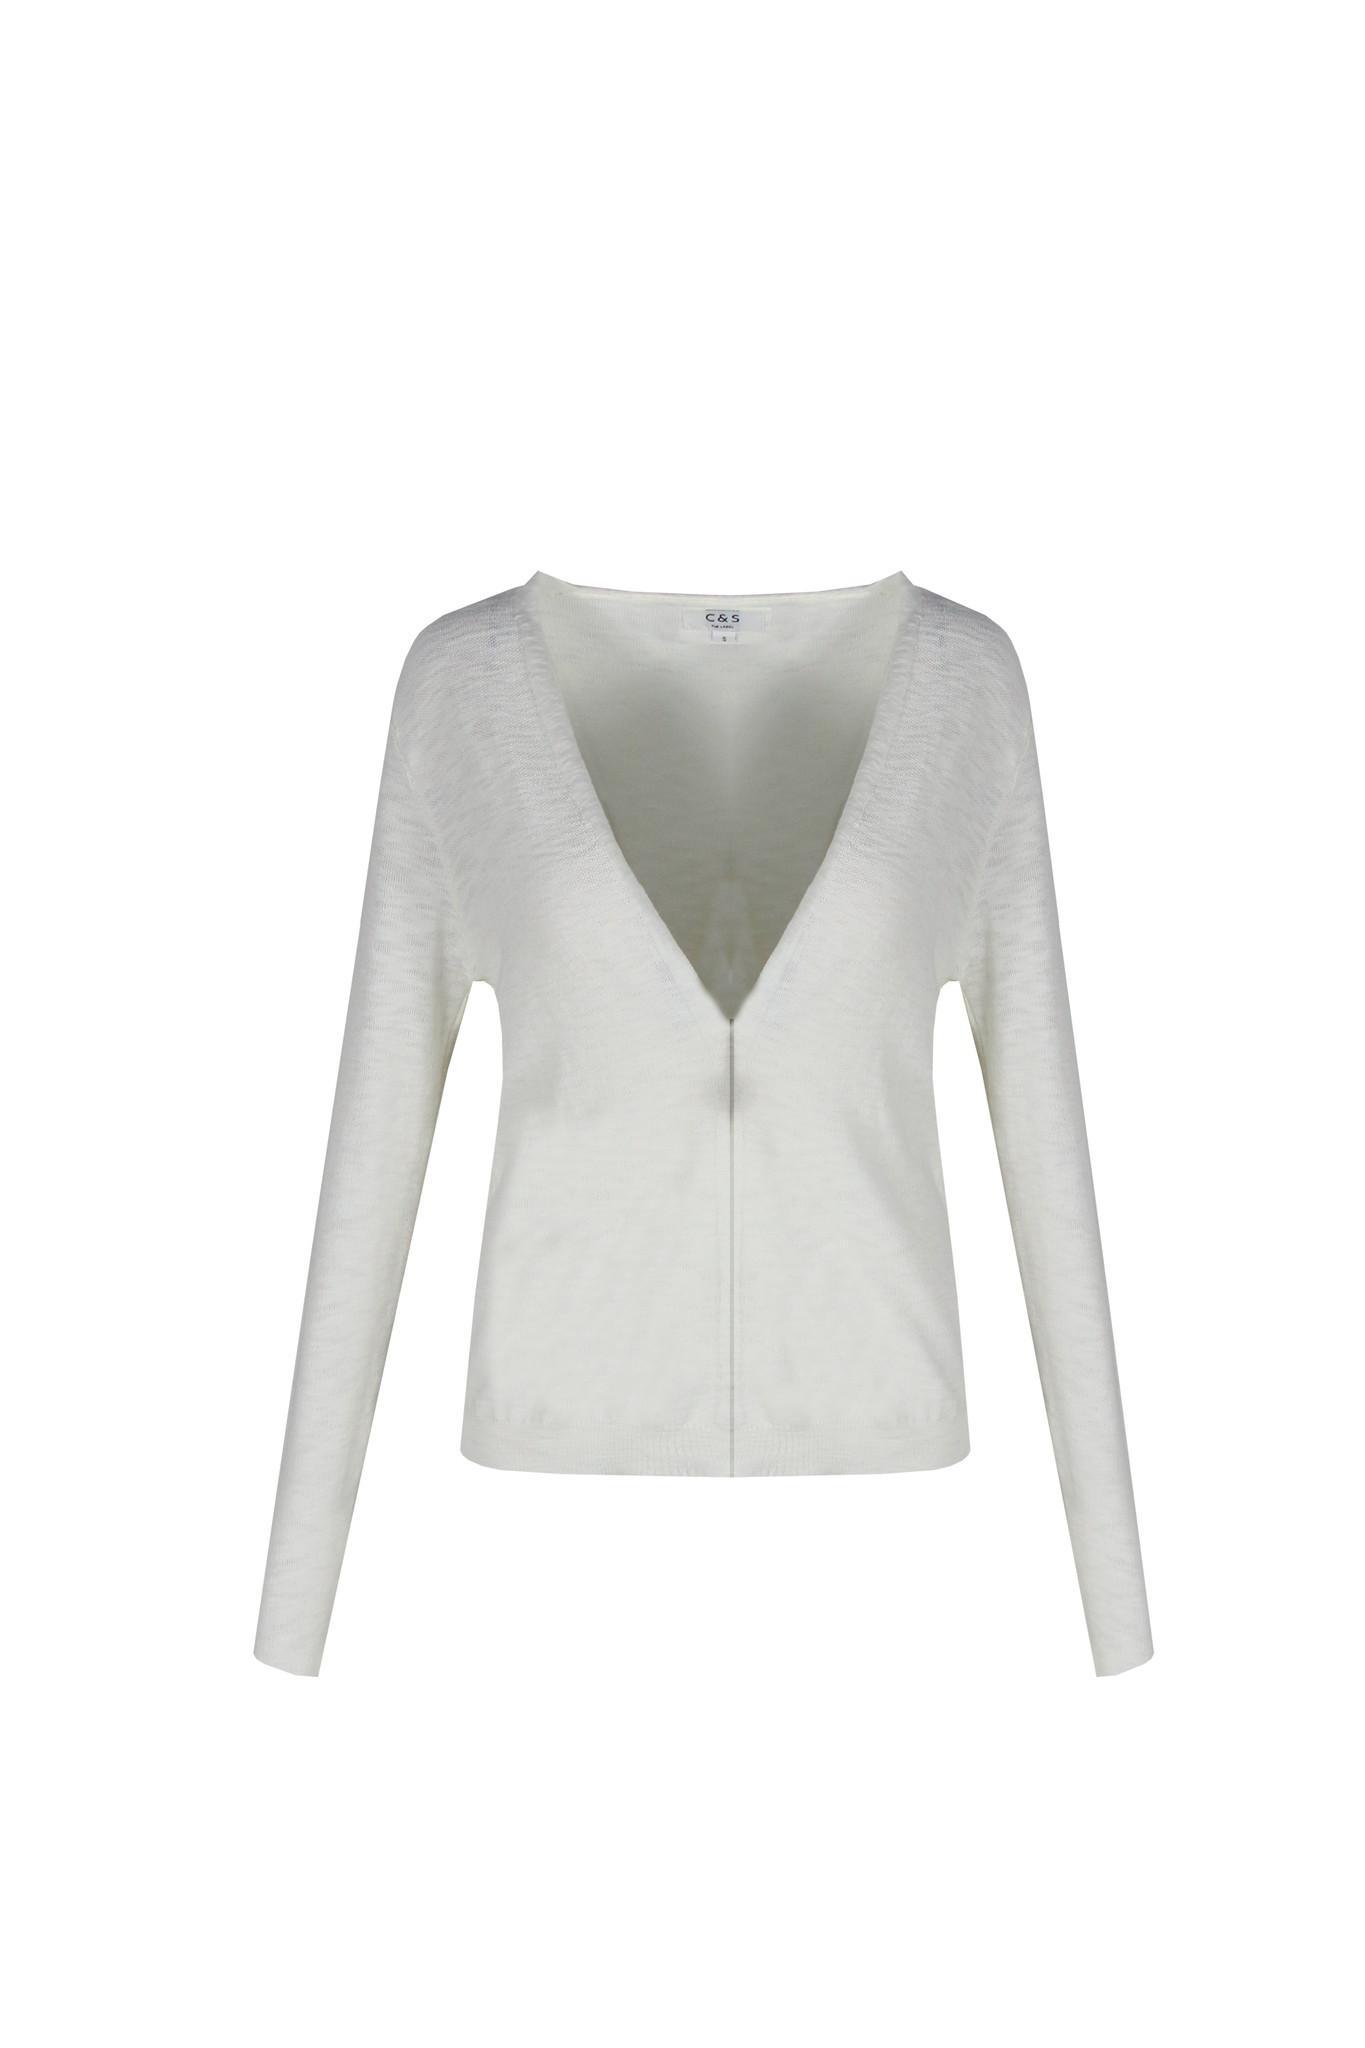 C&S The label C&S The label vest Marlette off-white